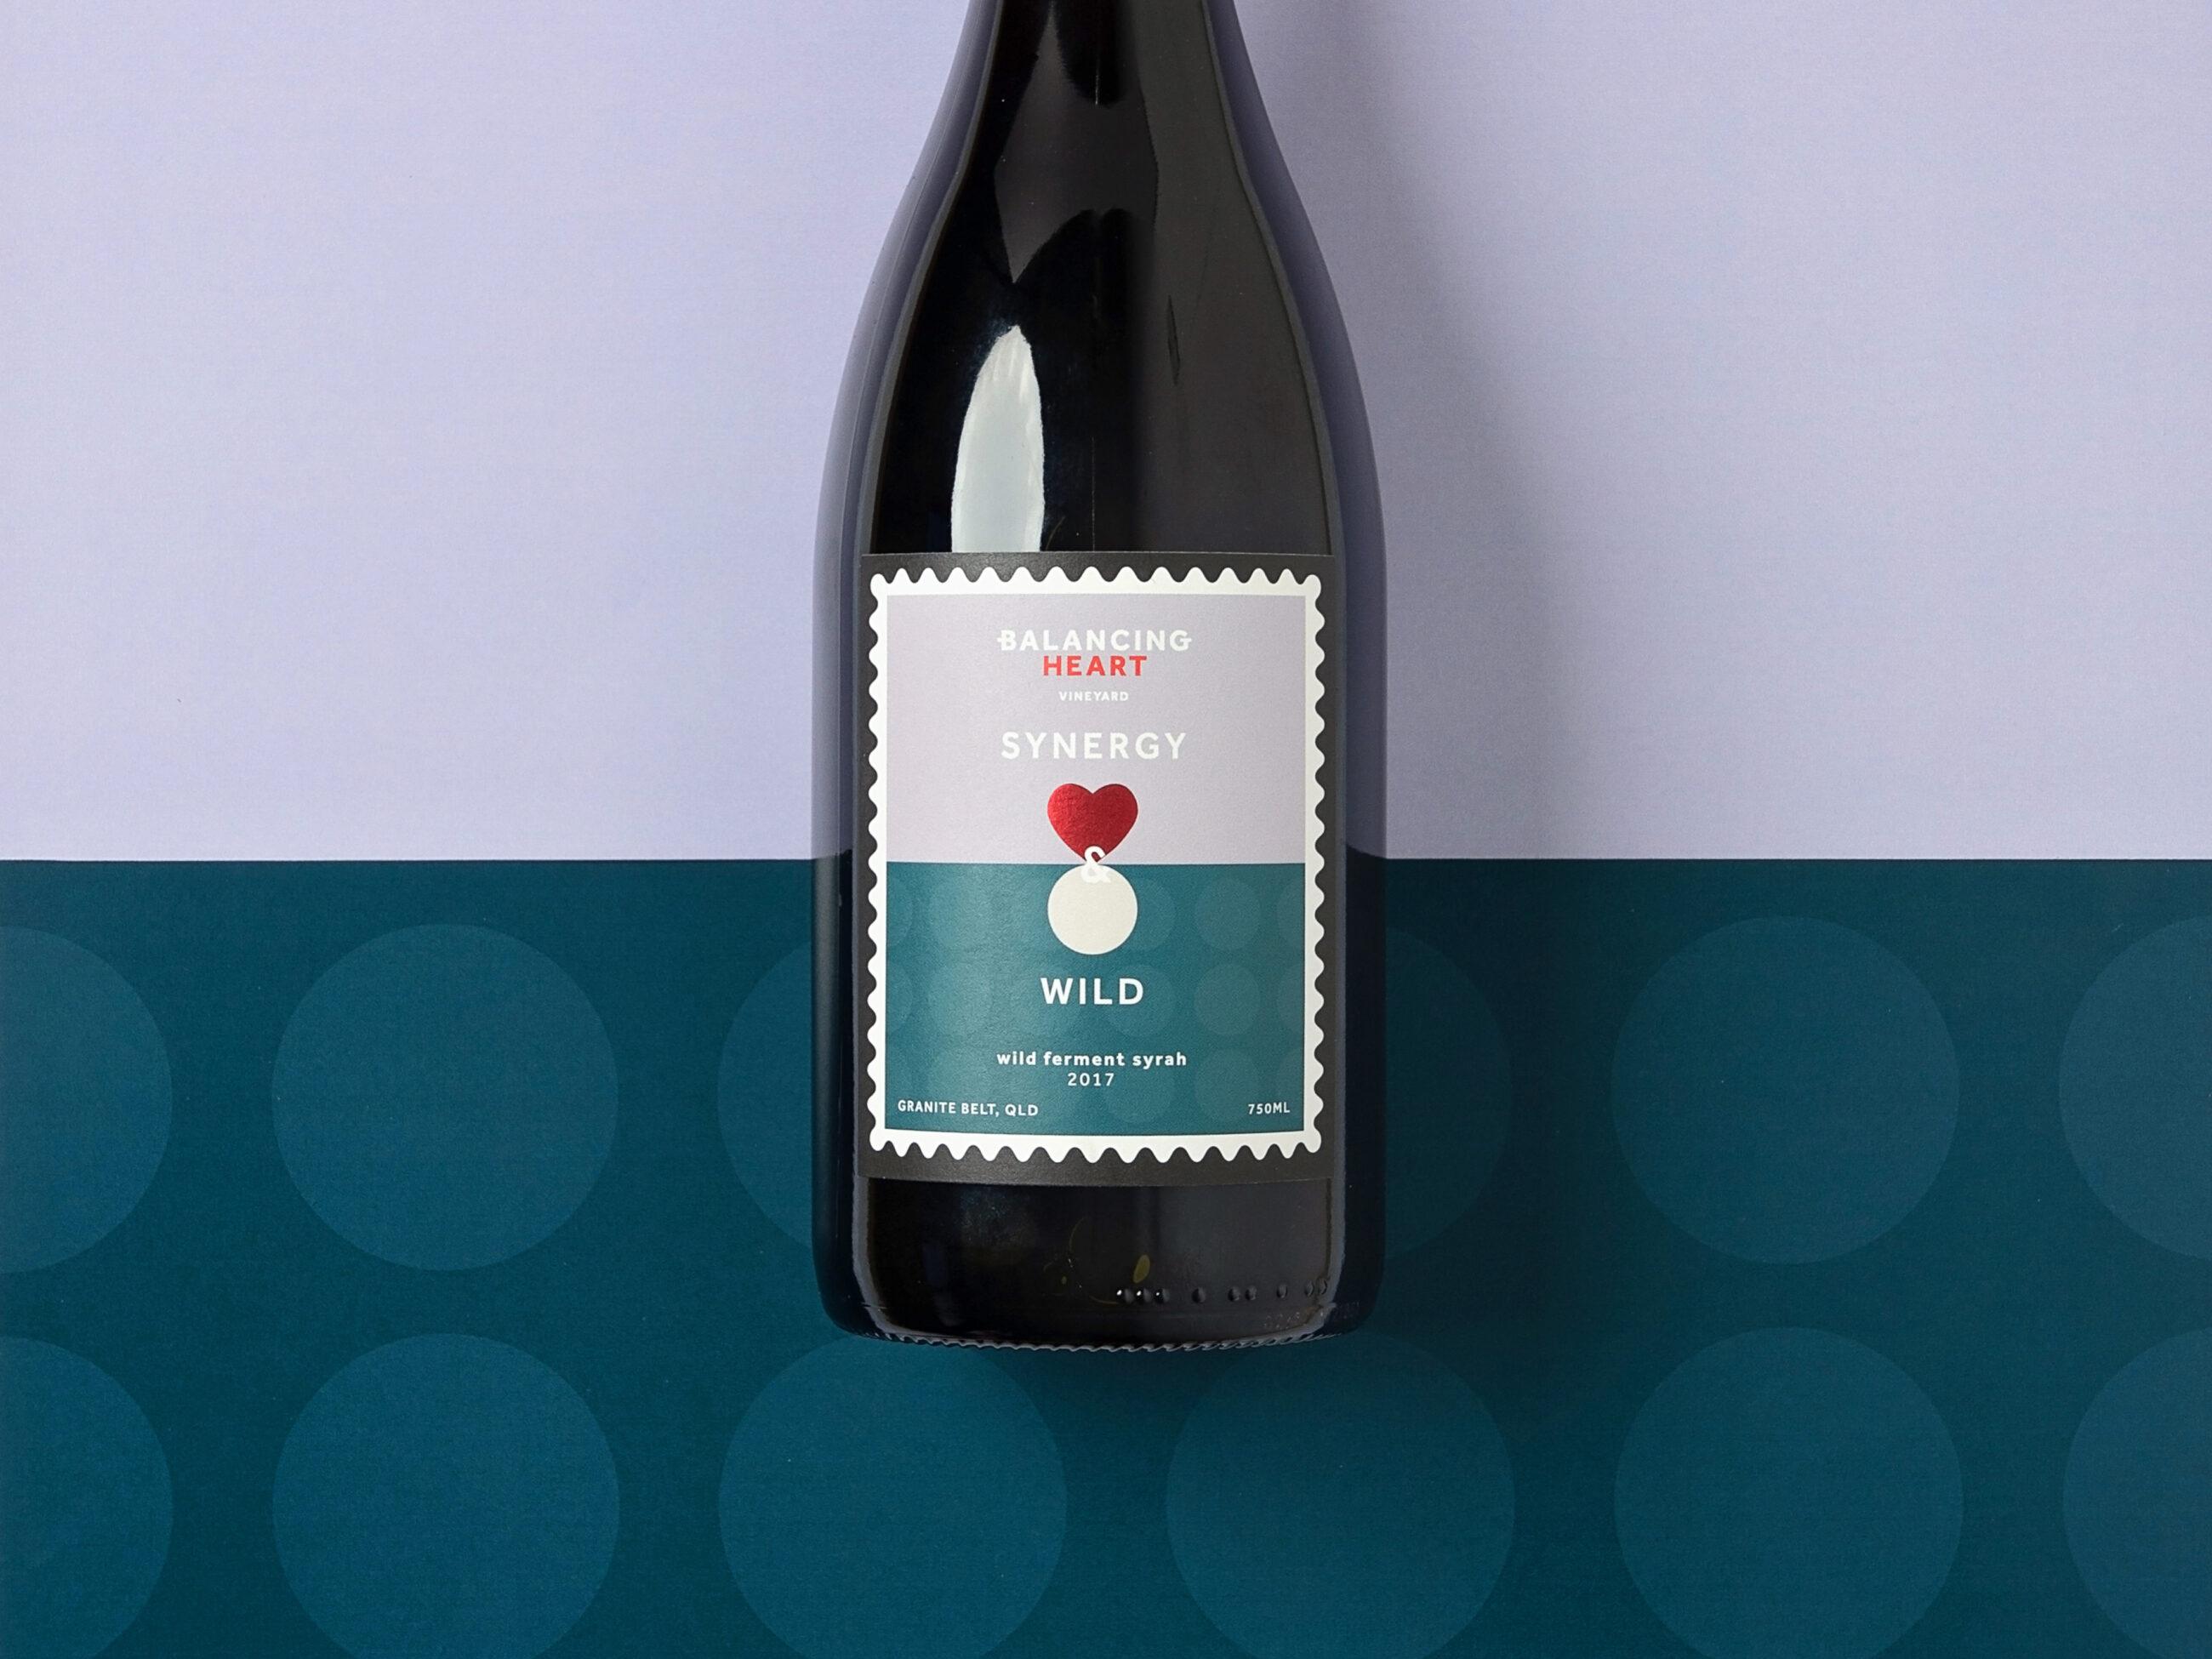 Bottle of Balancing Heart wine